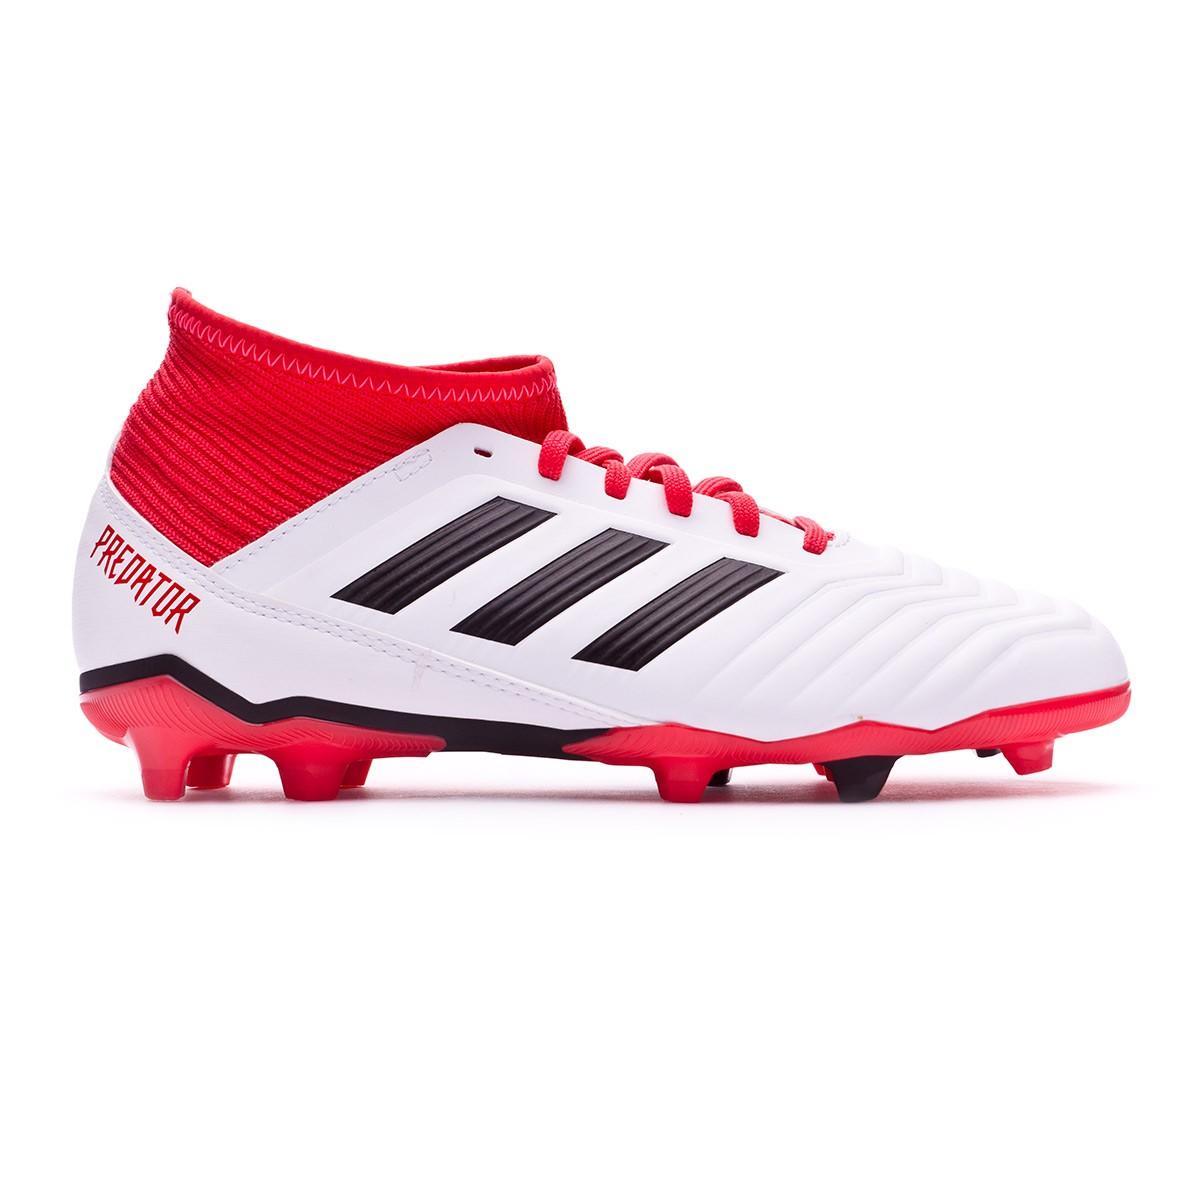 384c8d772e149 Zapatos de fútbol adidas Predator 18.3 FG Niño White-Core black-Real coral  - Tienda de fútbol Fútbol Emotion